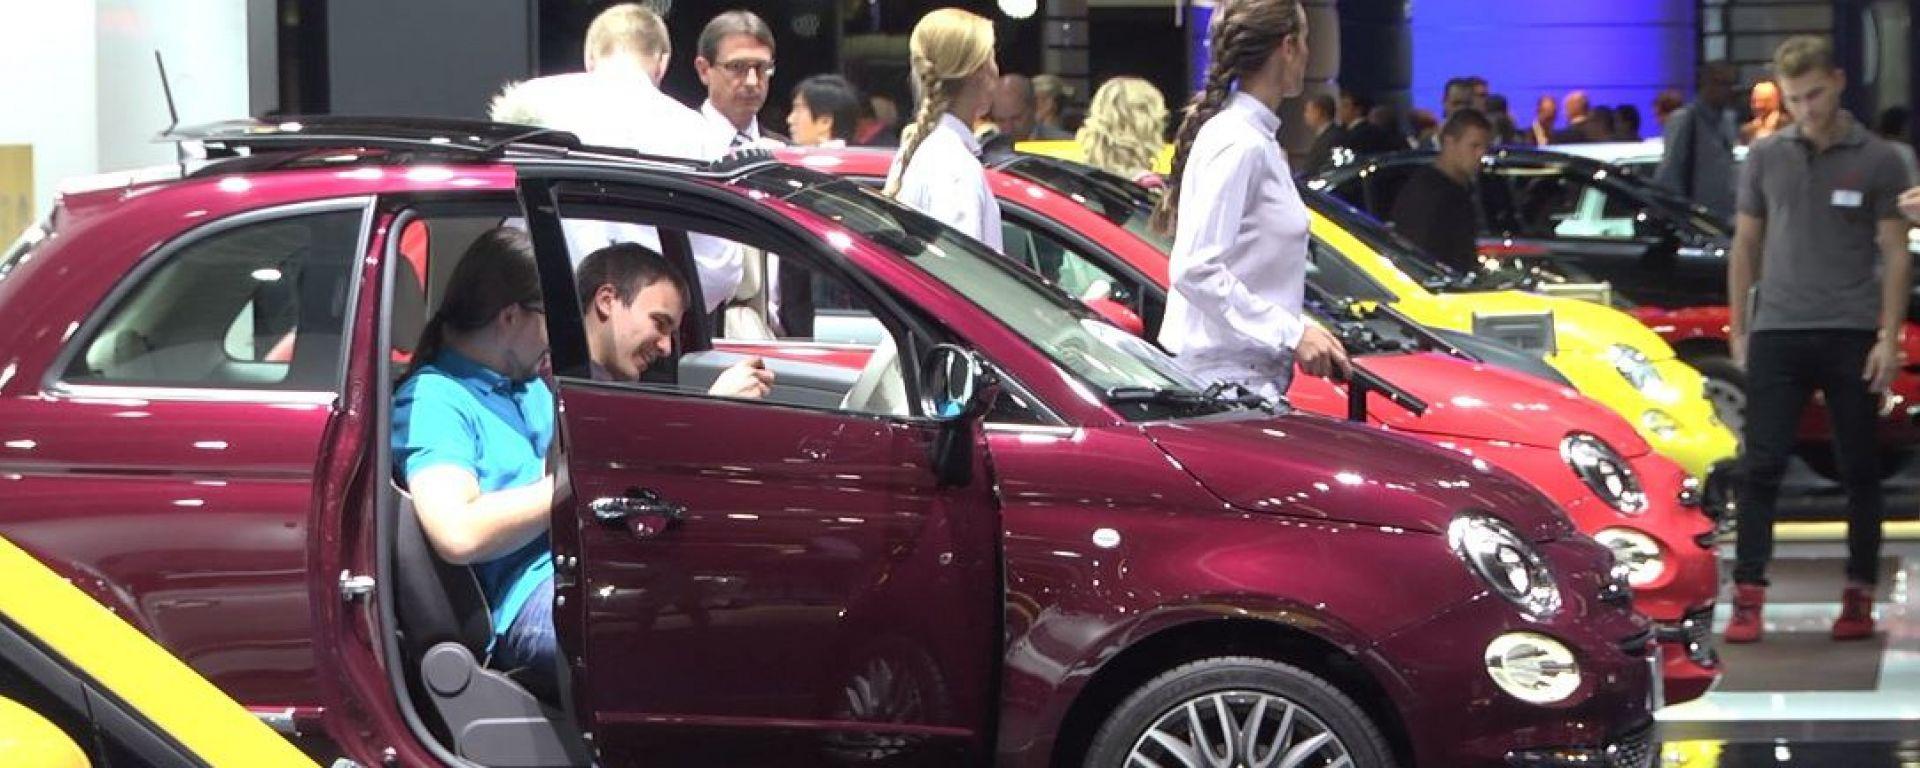 IAA Francoforte 2015: la gamma Fiat 500